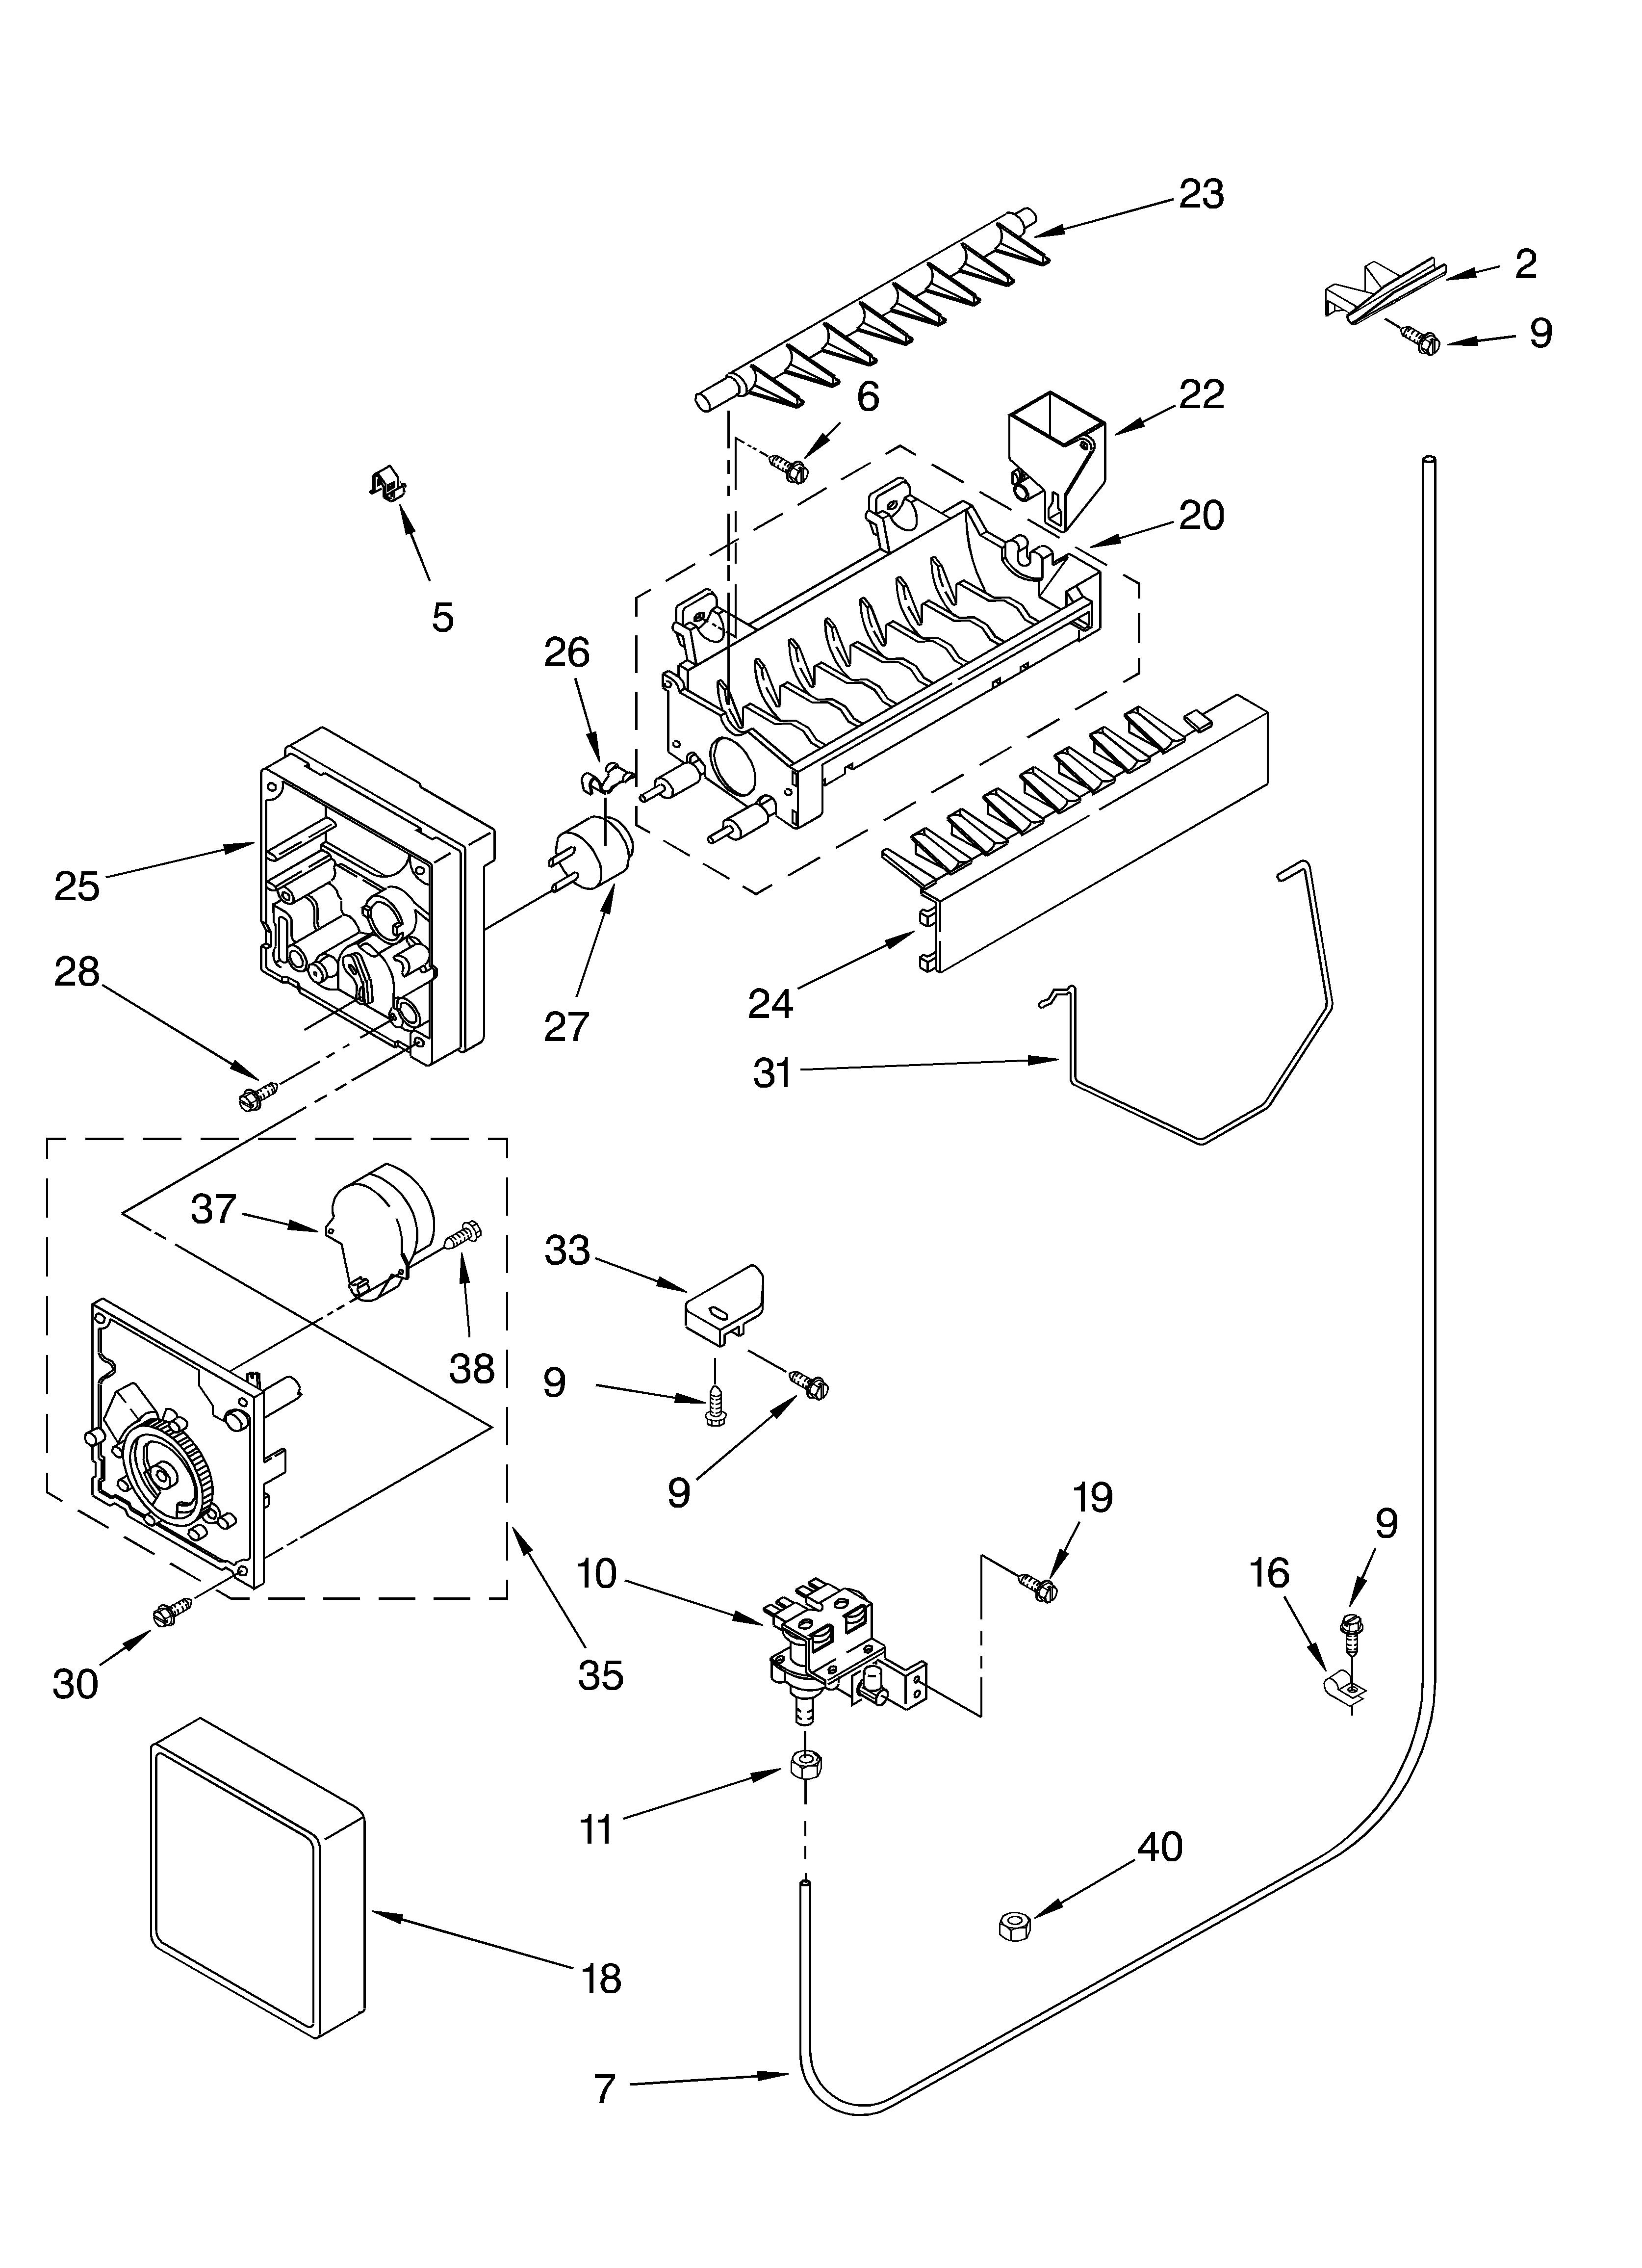 31 whirlpool ice maker wiring diagram